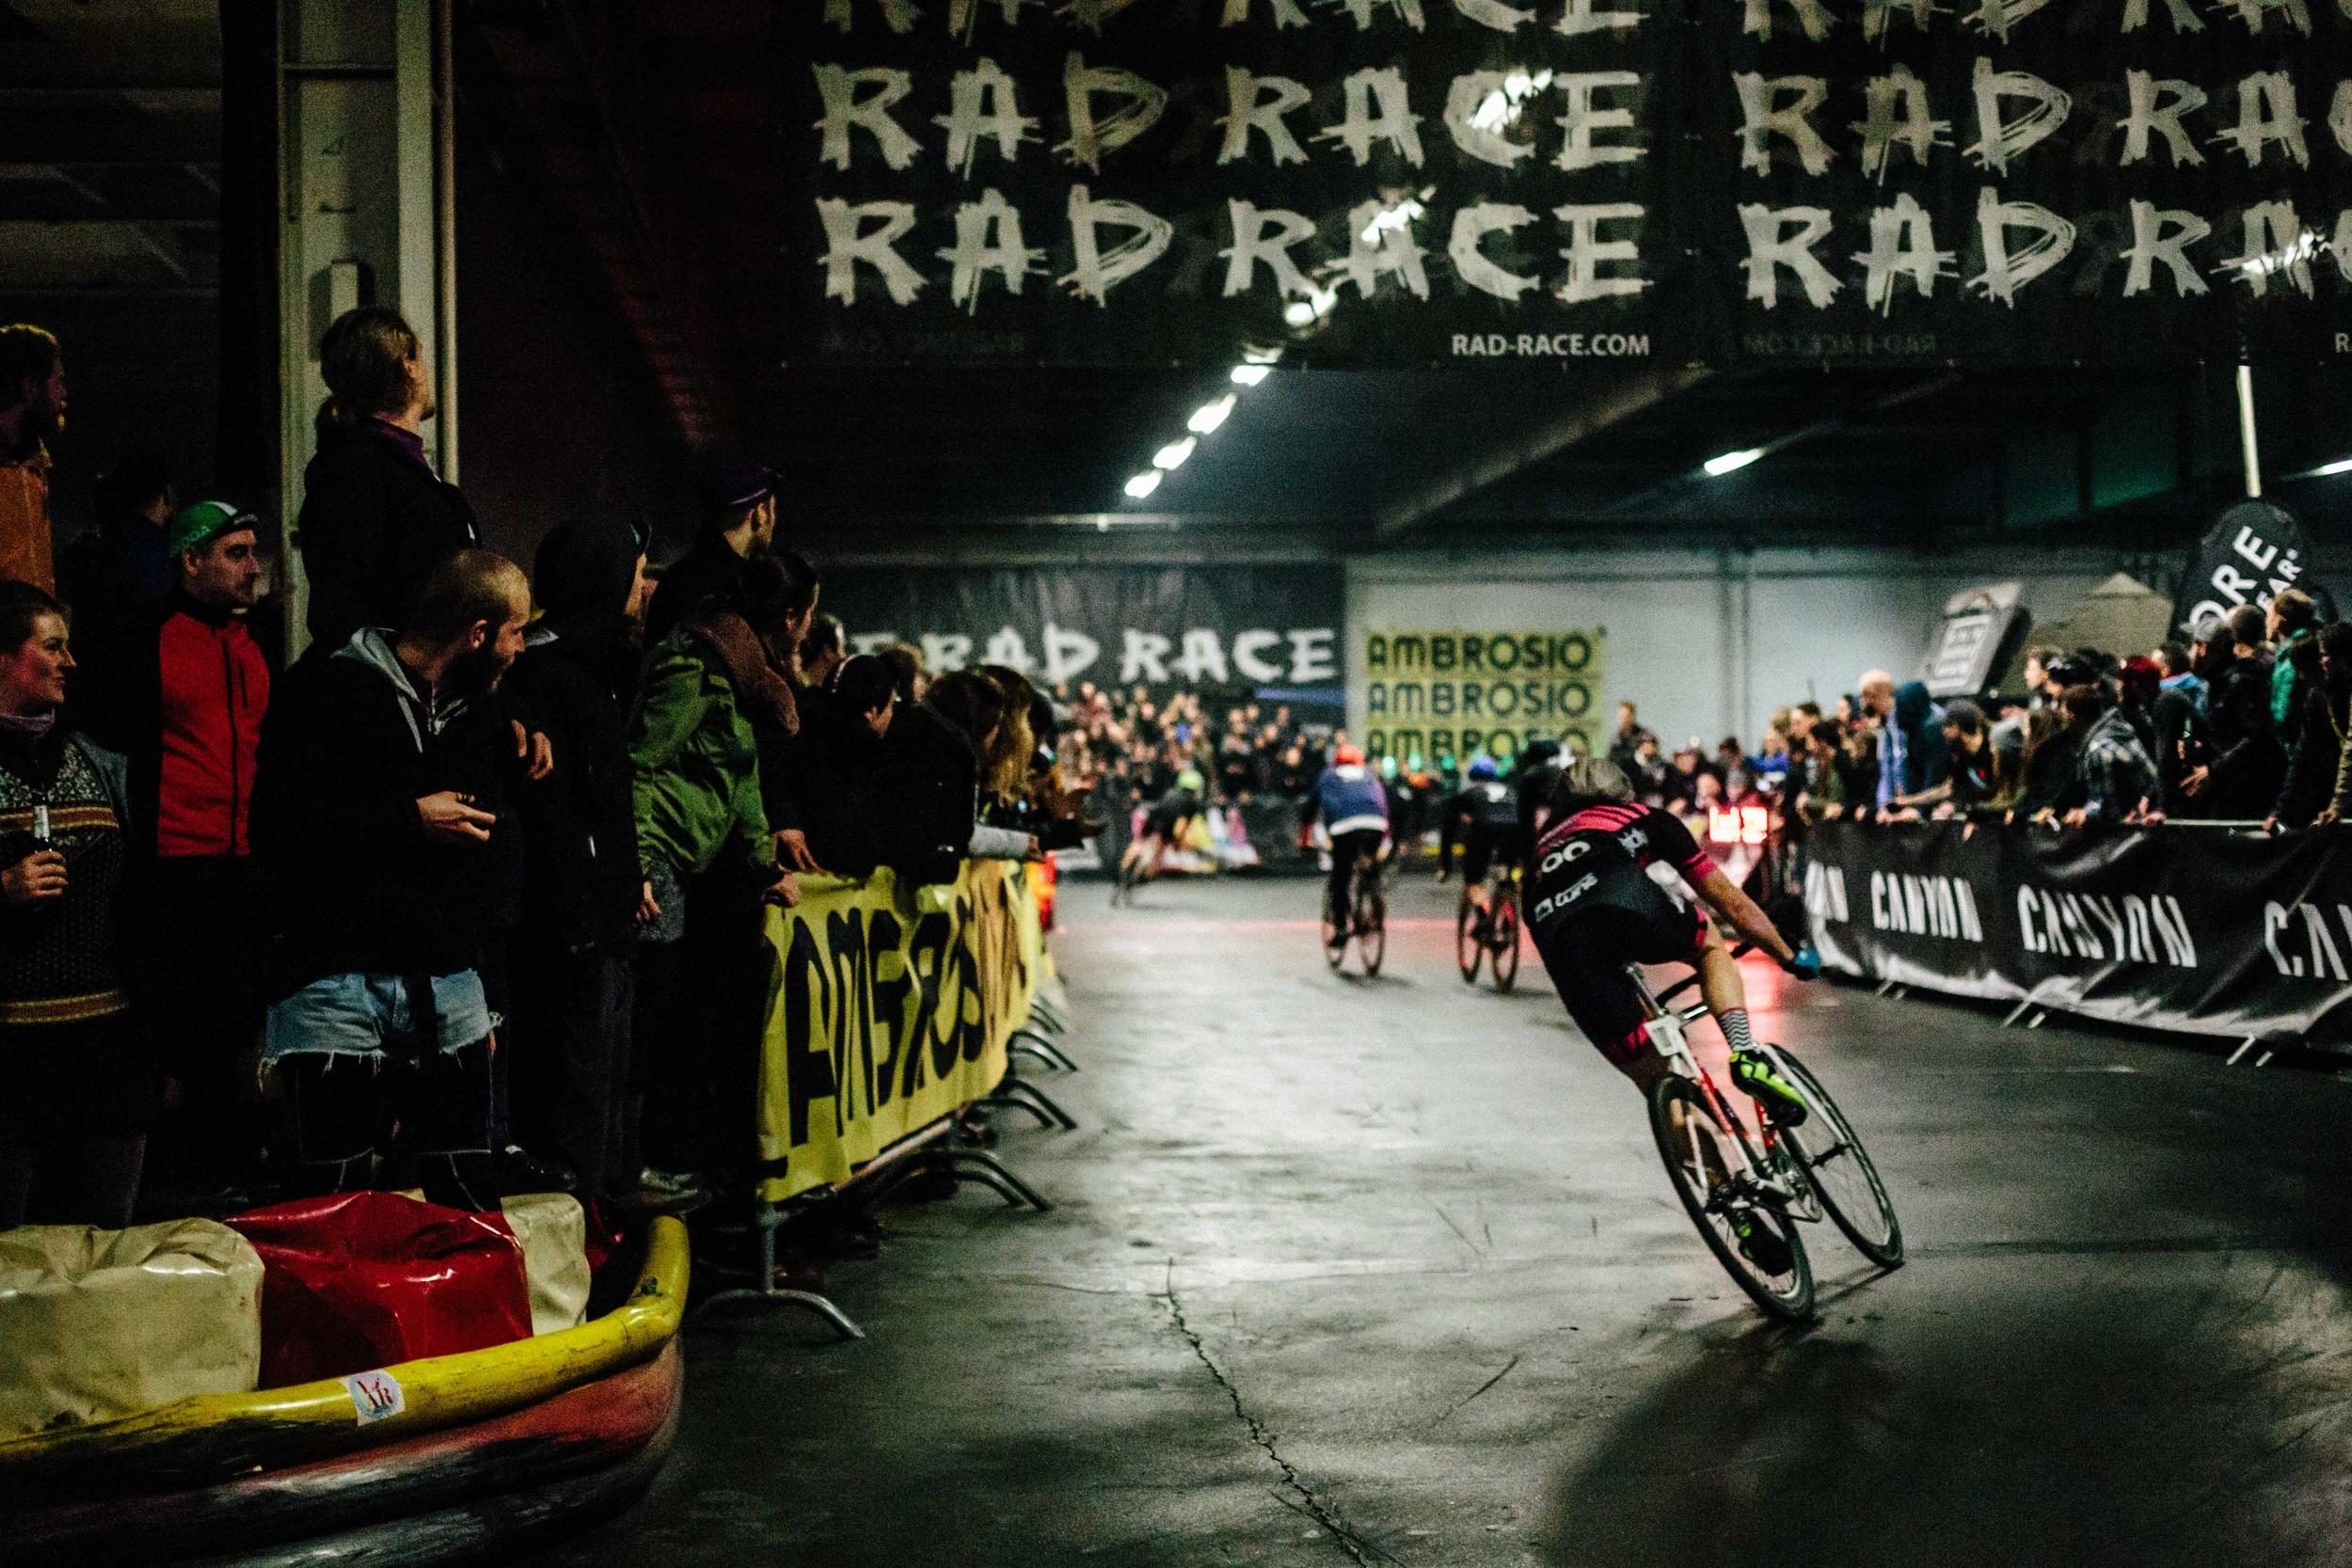 RAD RACE Last Man Standing, Berlin March 19 2016 - Shot by Bengt Stiller 5.jpg